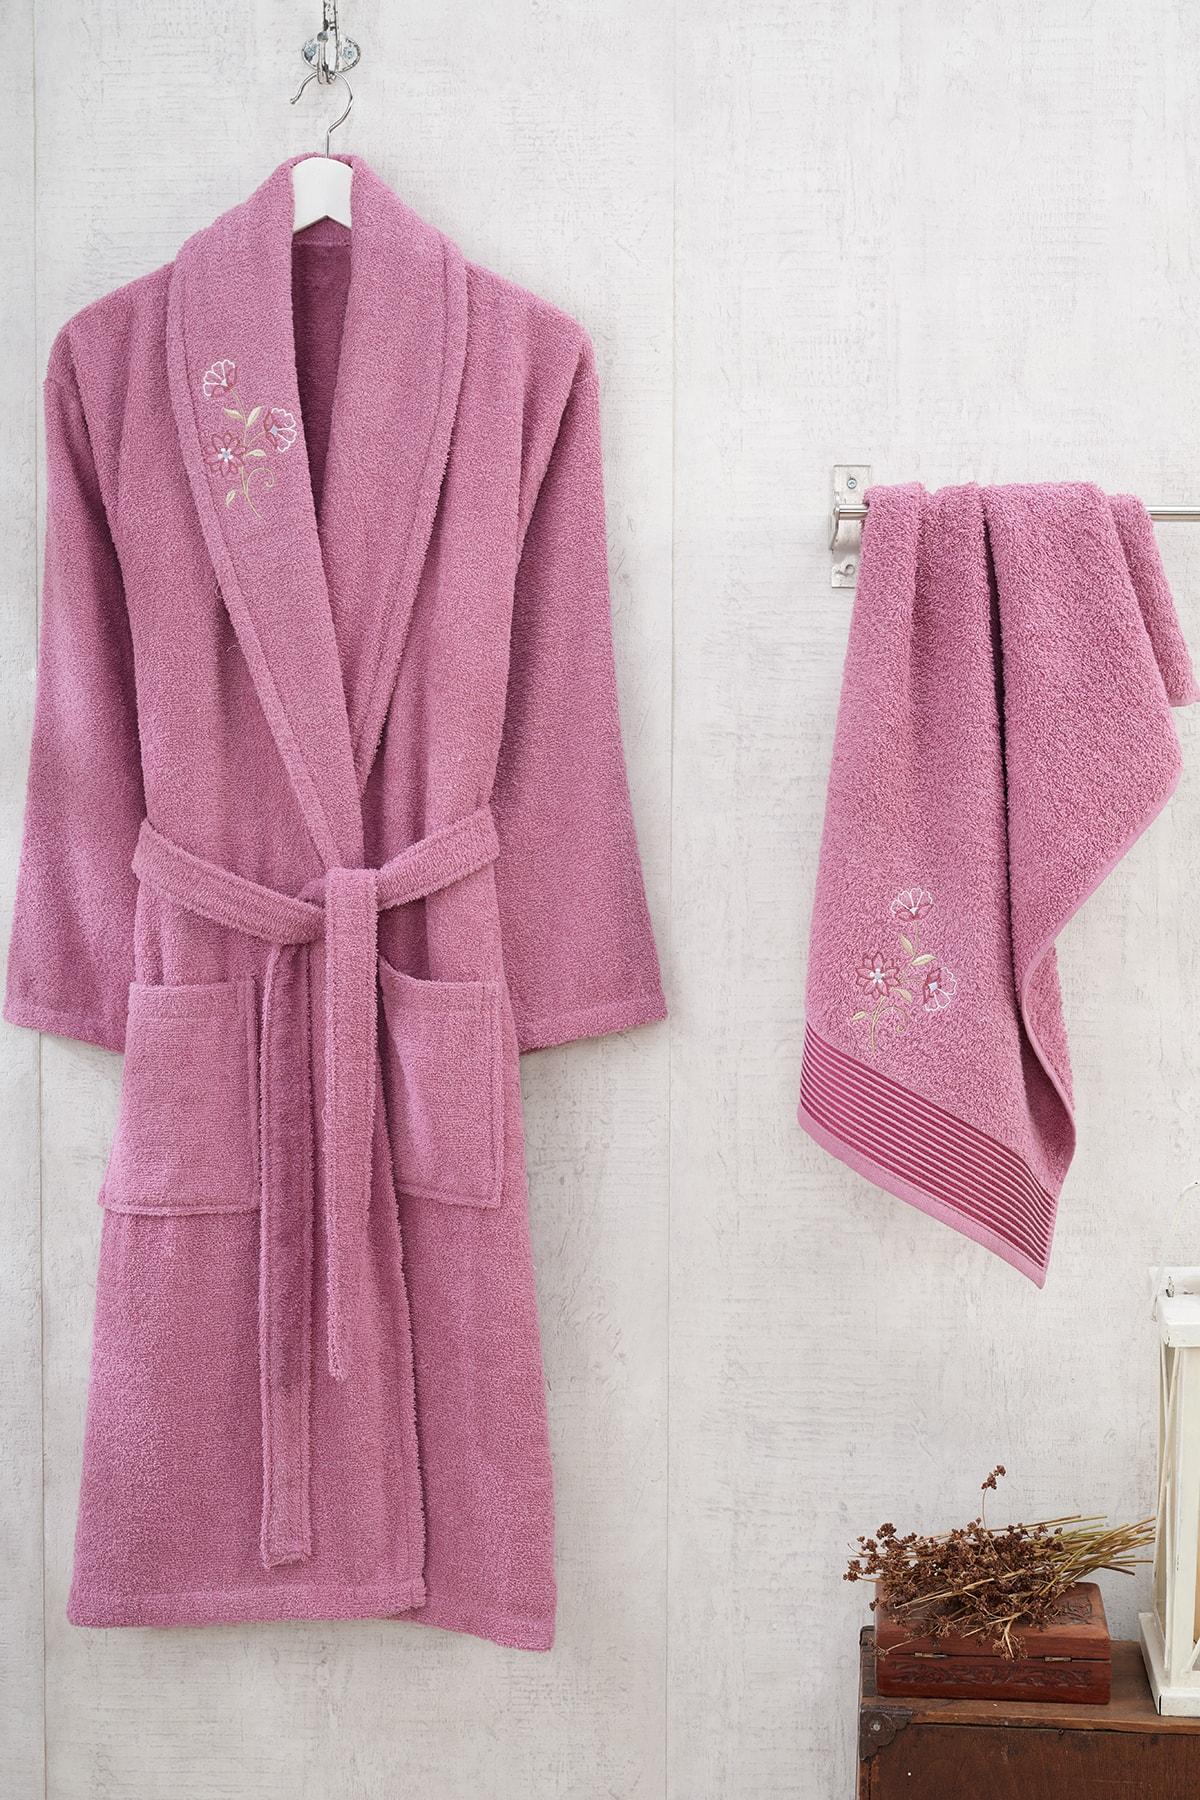 2 Piece Women 'S Towel Bathrobe Set Plum Red 100% Cotton Soft Maximum Absorbency